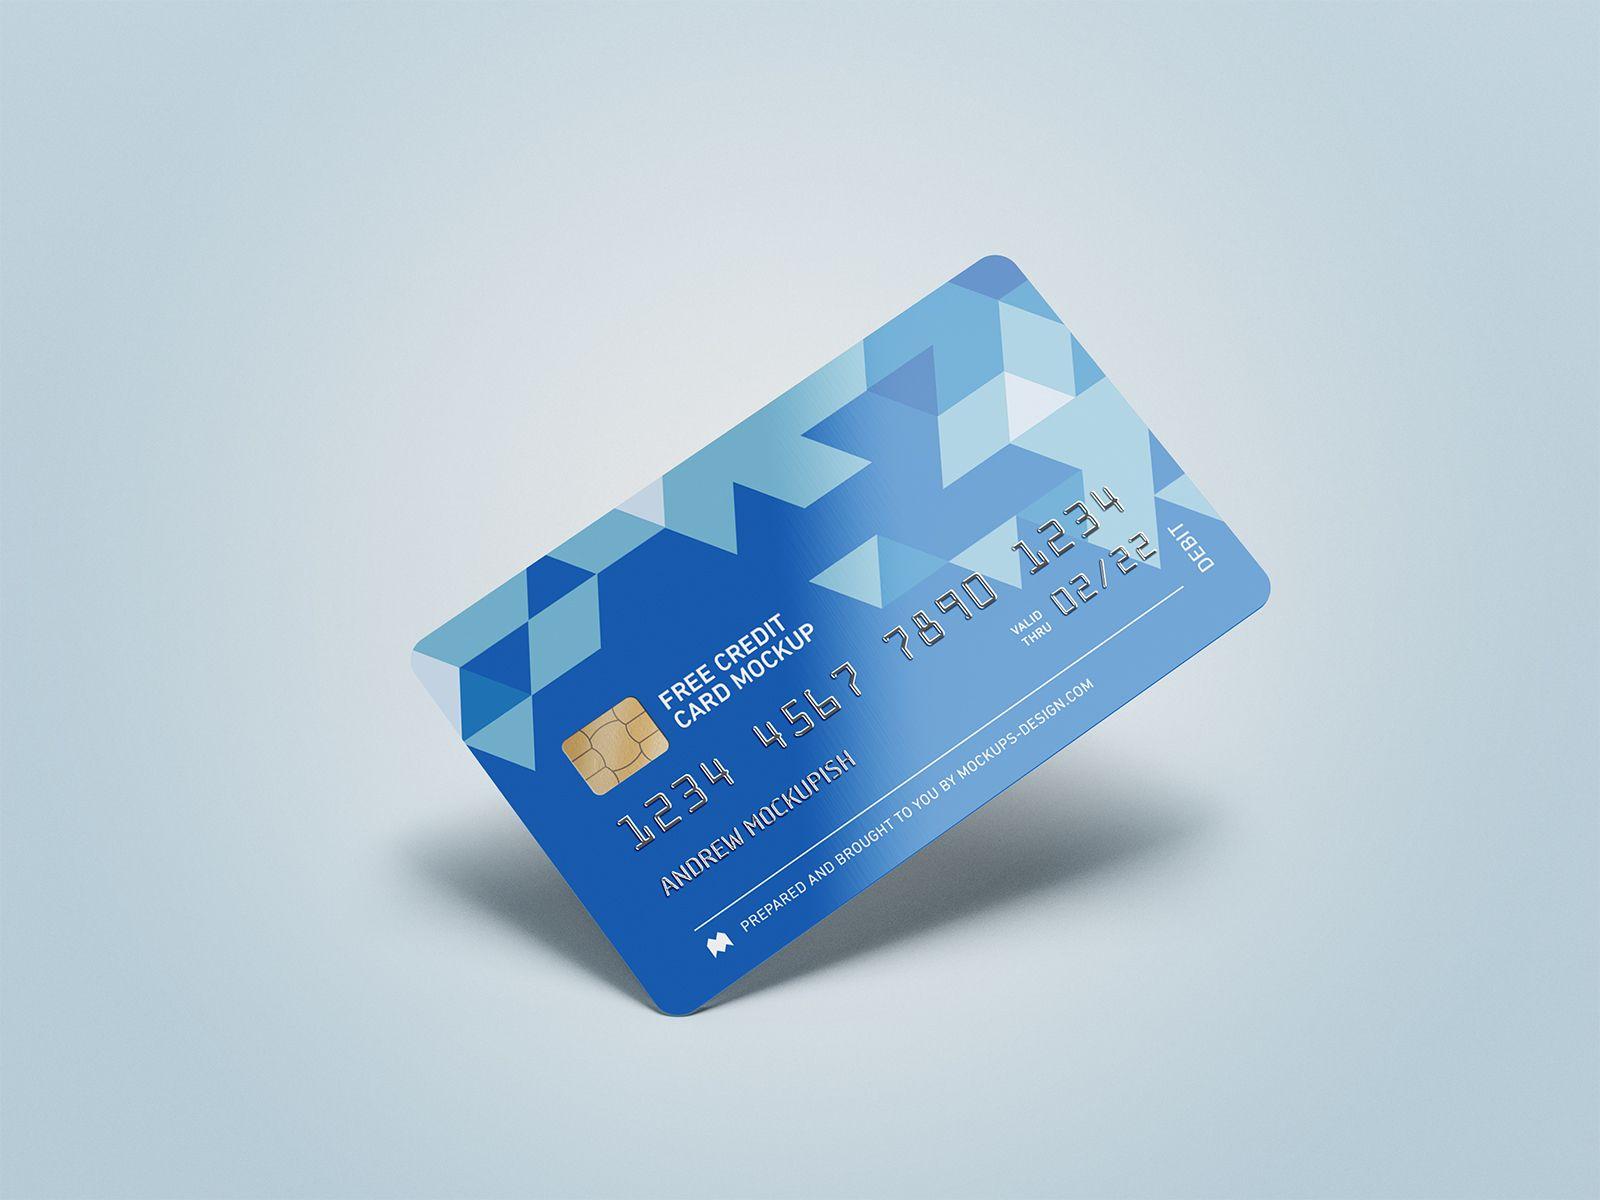 Free Credit Card Mockup Psd Free Mockup Free Credit Card Credit Card Design Bank Card